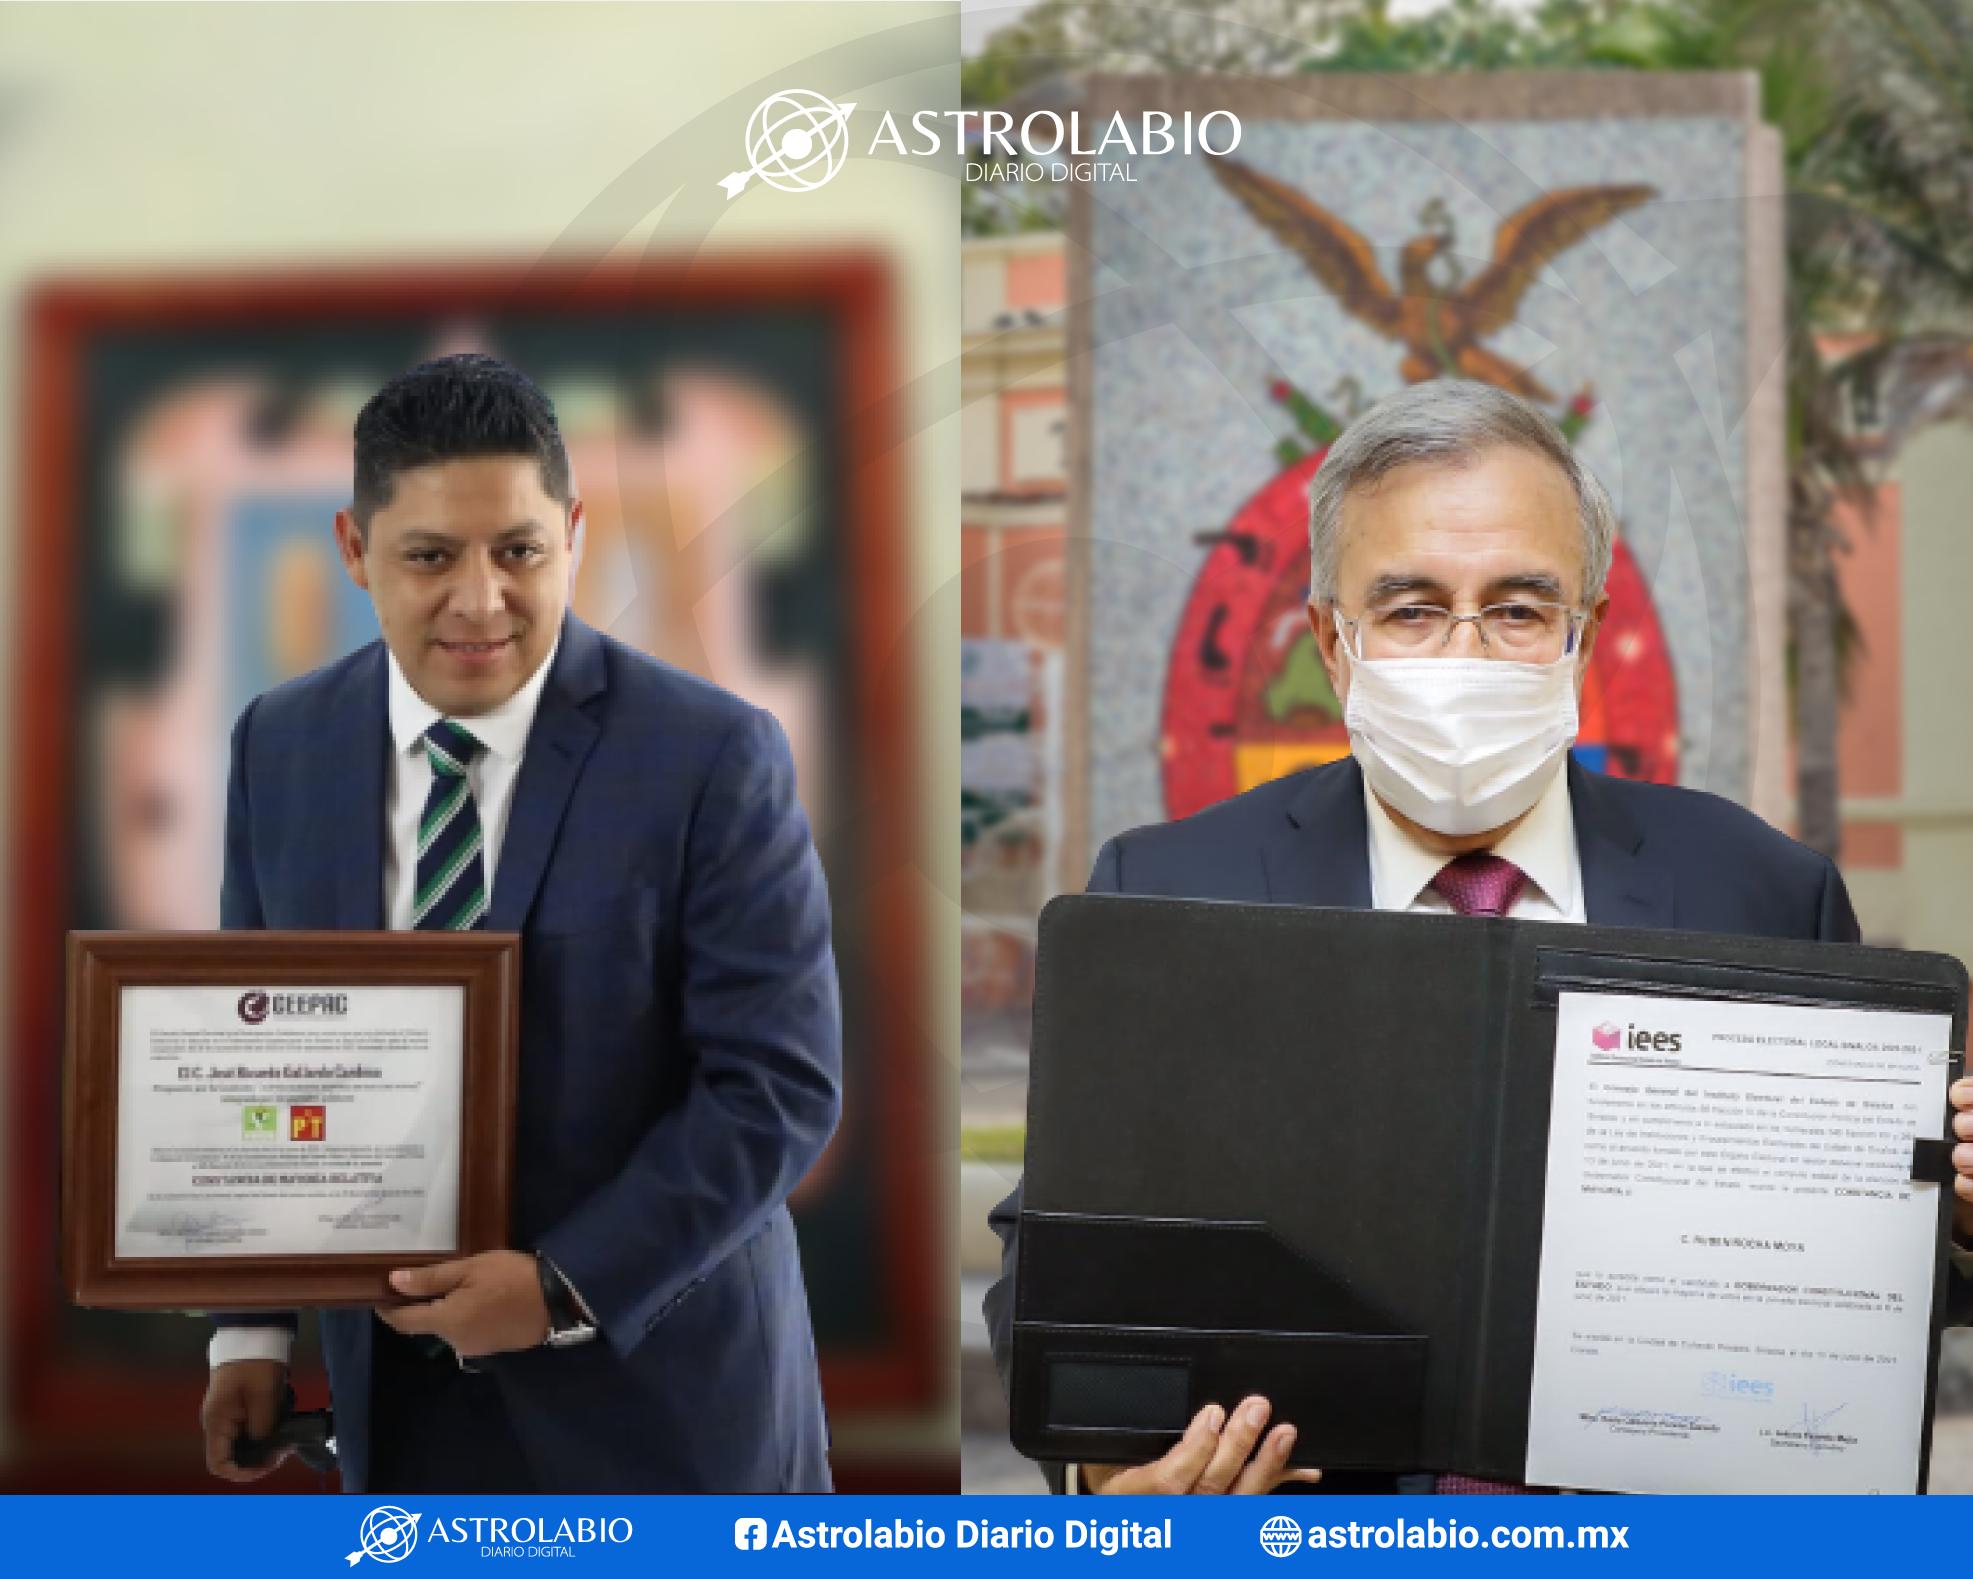 Centro Nacional de Inteligencia investiga a  Ricardo Gallardo y Rubén Rocha: Milenio